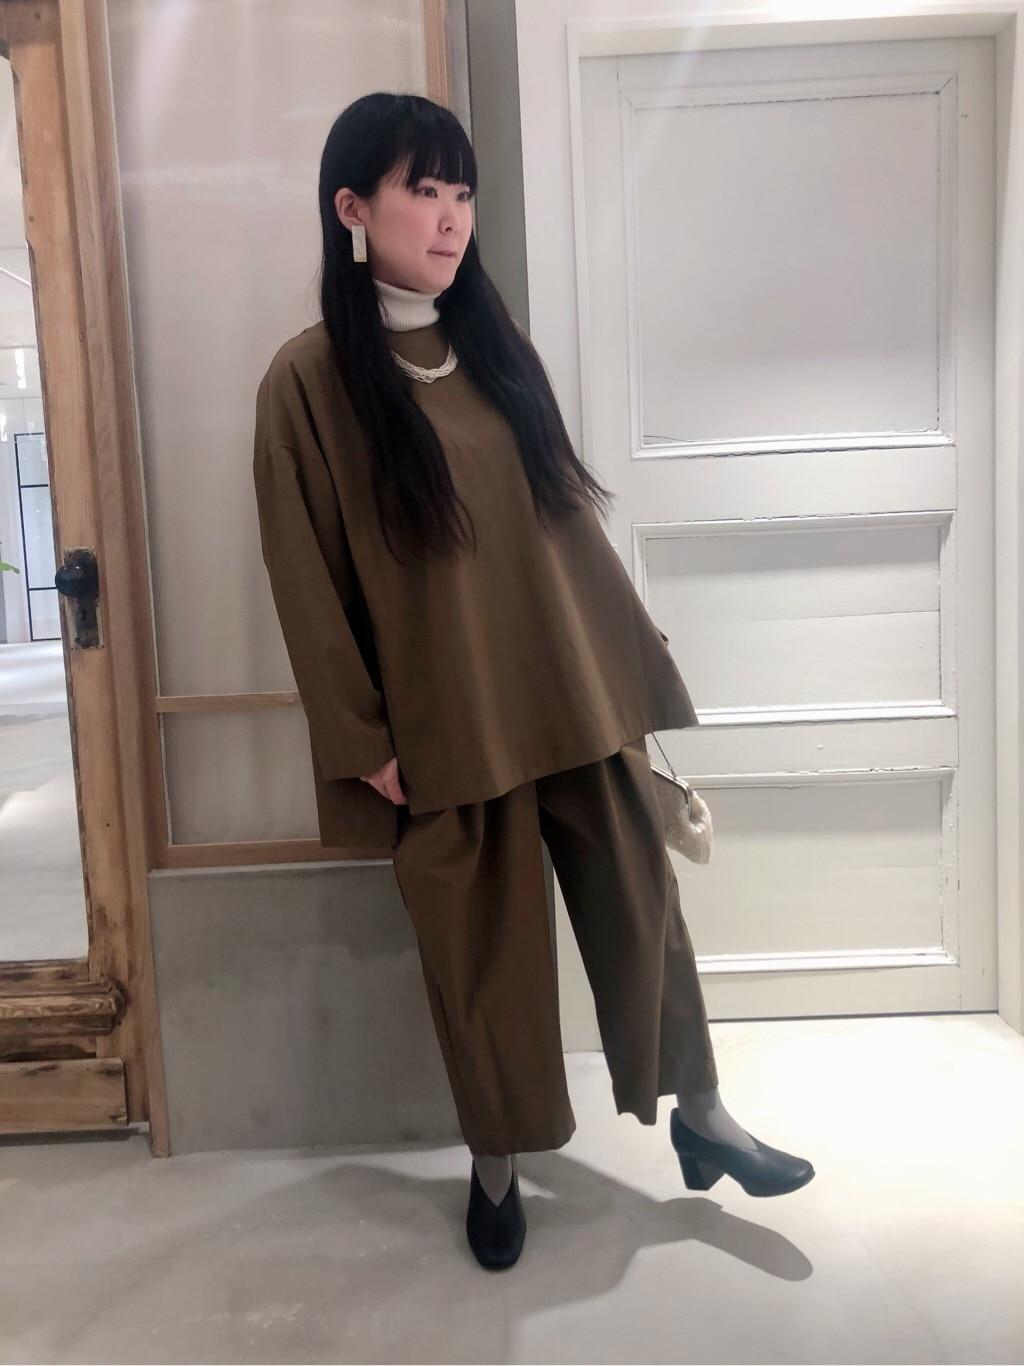 bulle de savon 渋谷スクランブルスクエア 身長:157cm 2020.01.11